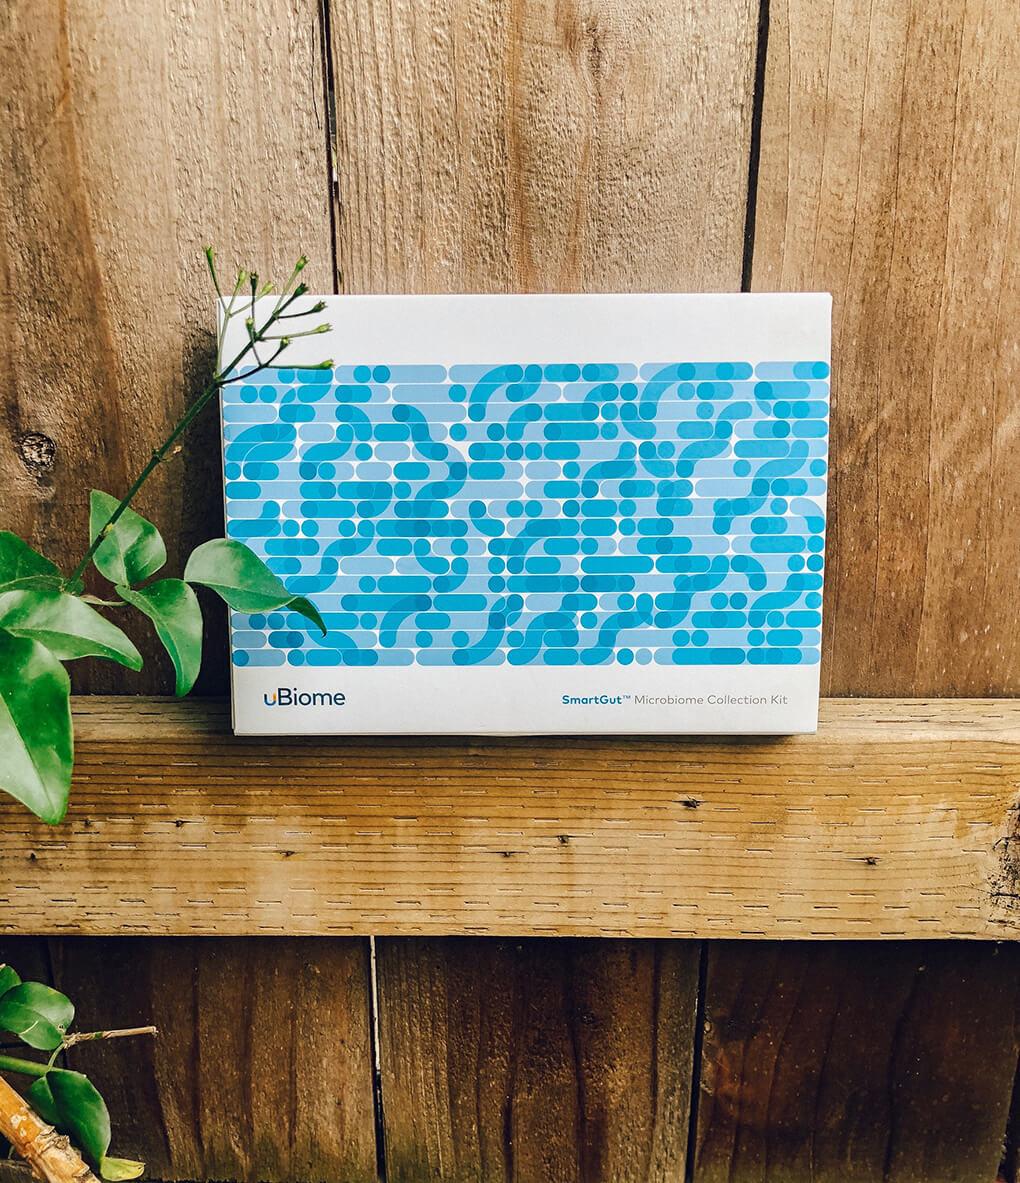 A Gutsy Girl Holiday 2018 Gut Health Wish List www.sarahkayhoffman.com 47 plus more holiday gut health gift ideas #holiday #guthealth #guthealing #holidaygifts #gifts U Biome SmartGut